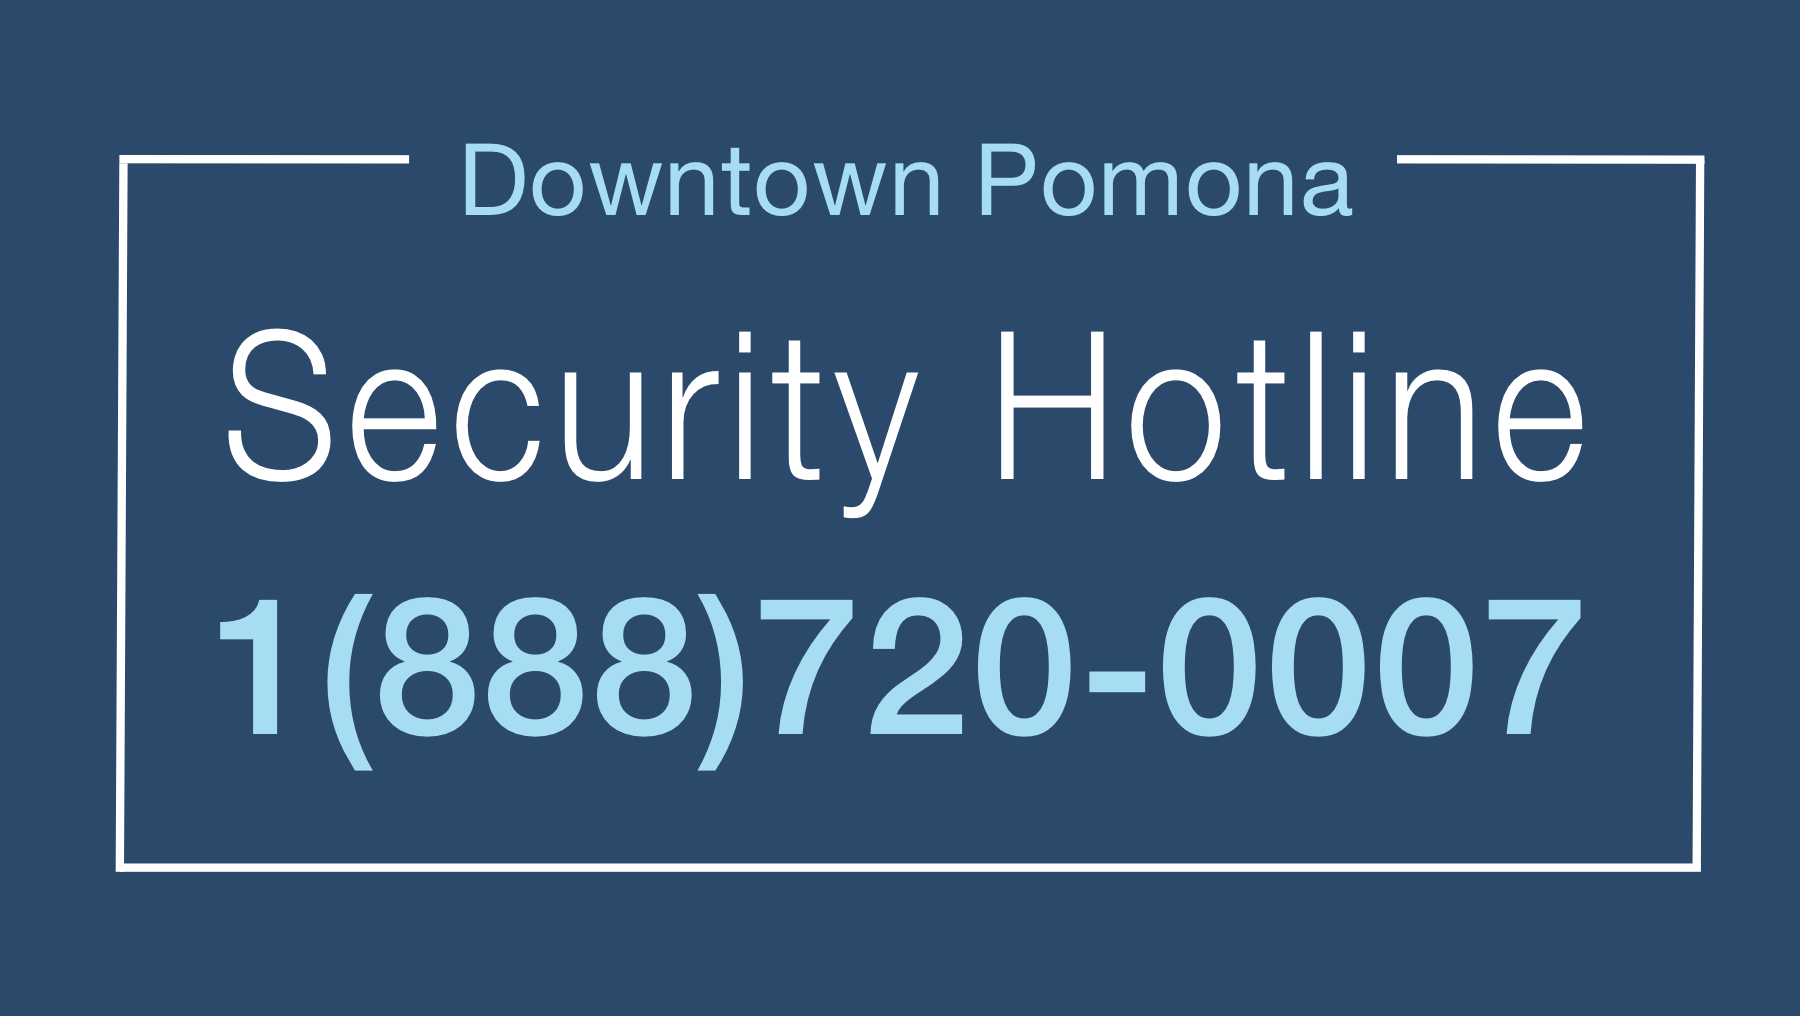 Downtown Pomona Security Hotline.jpg